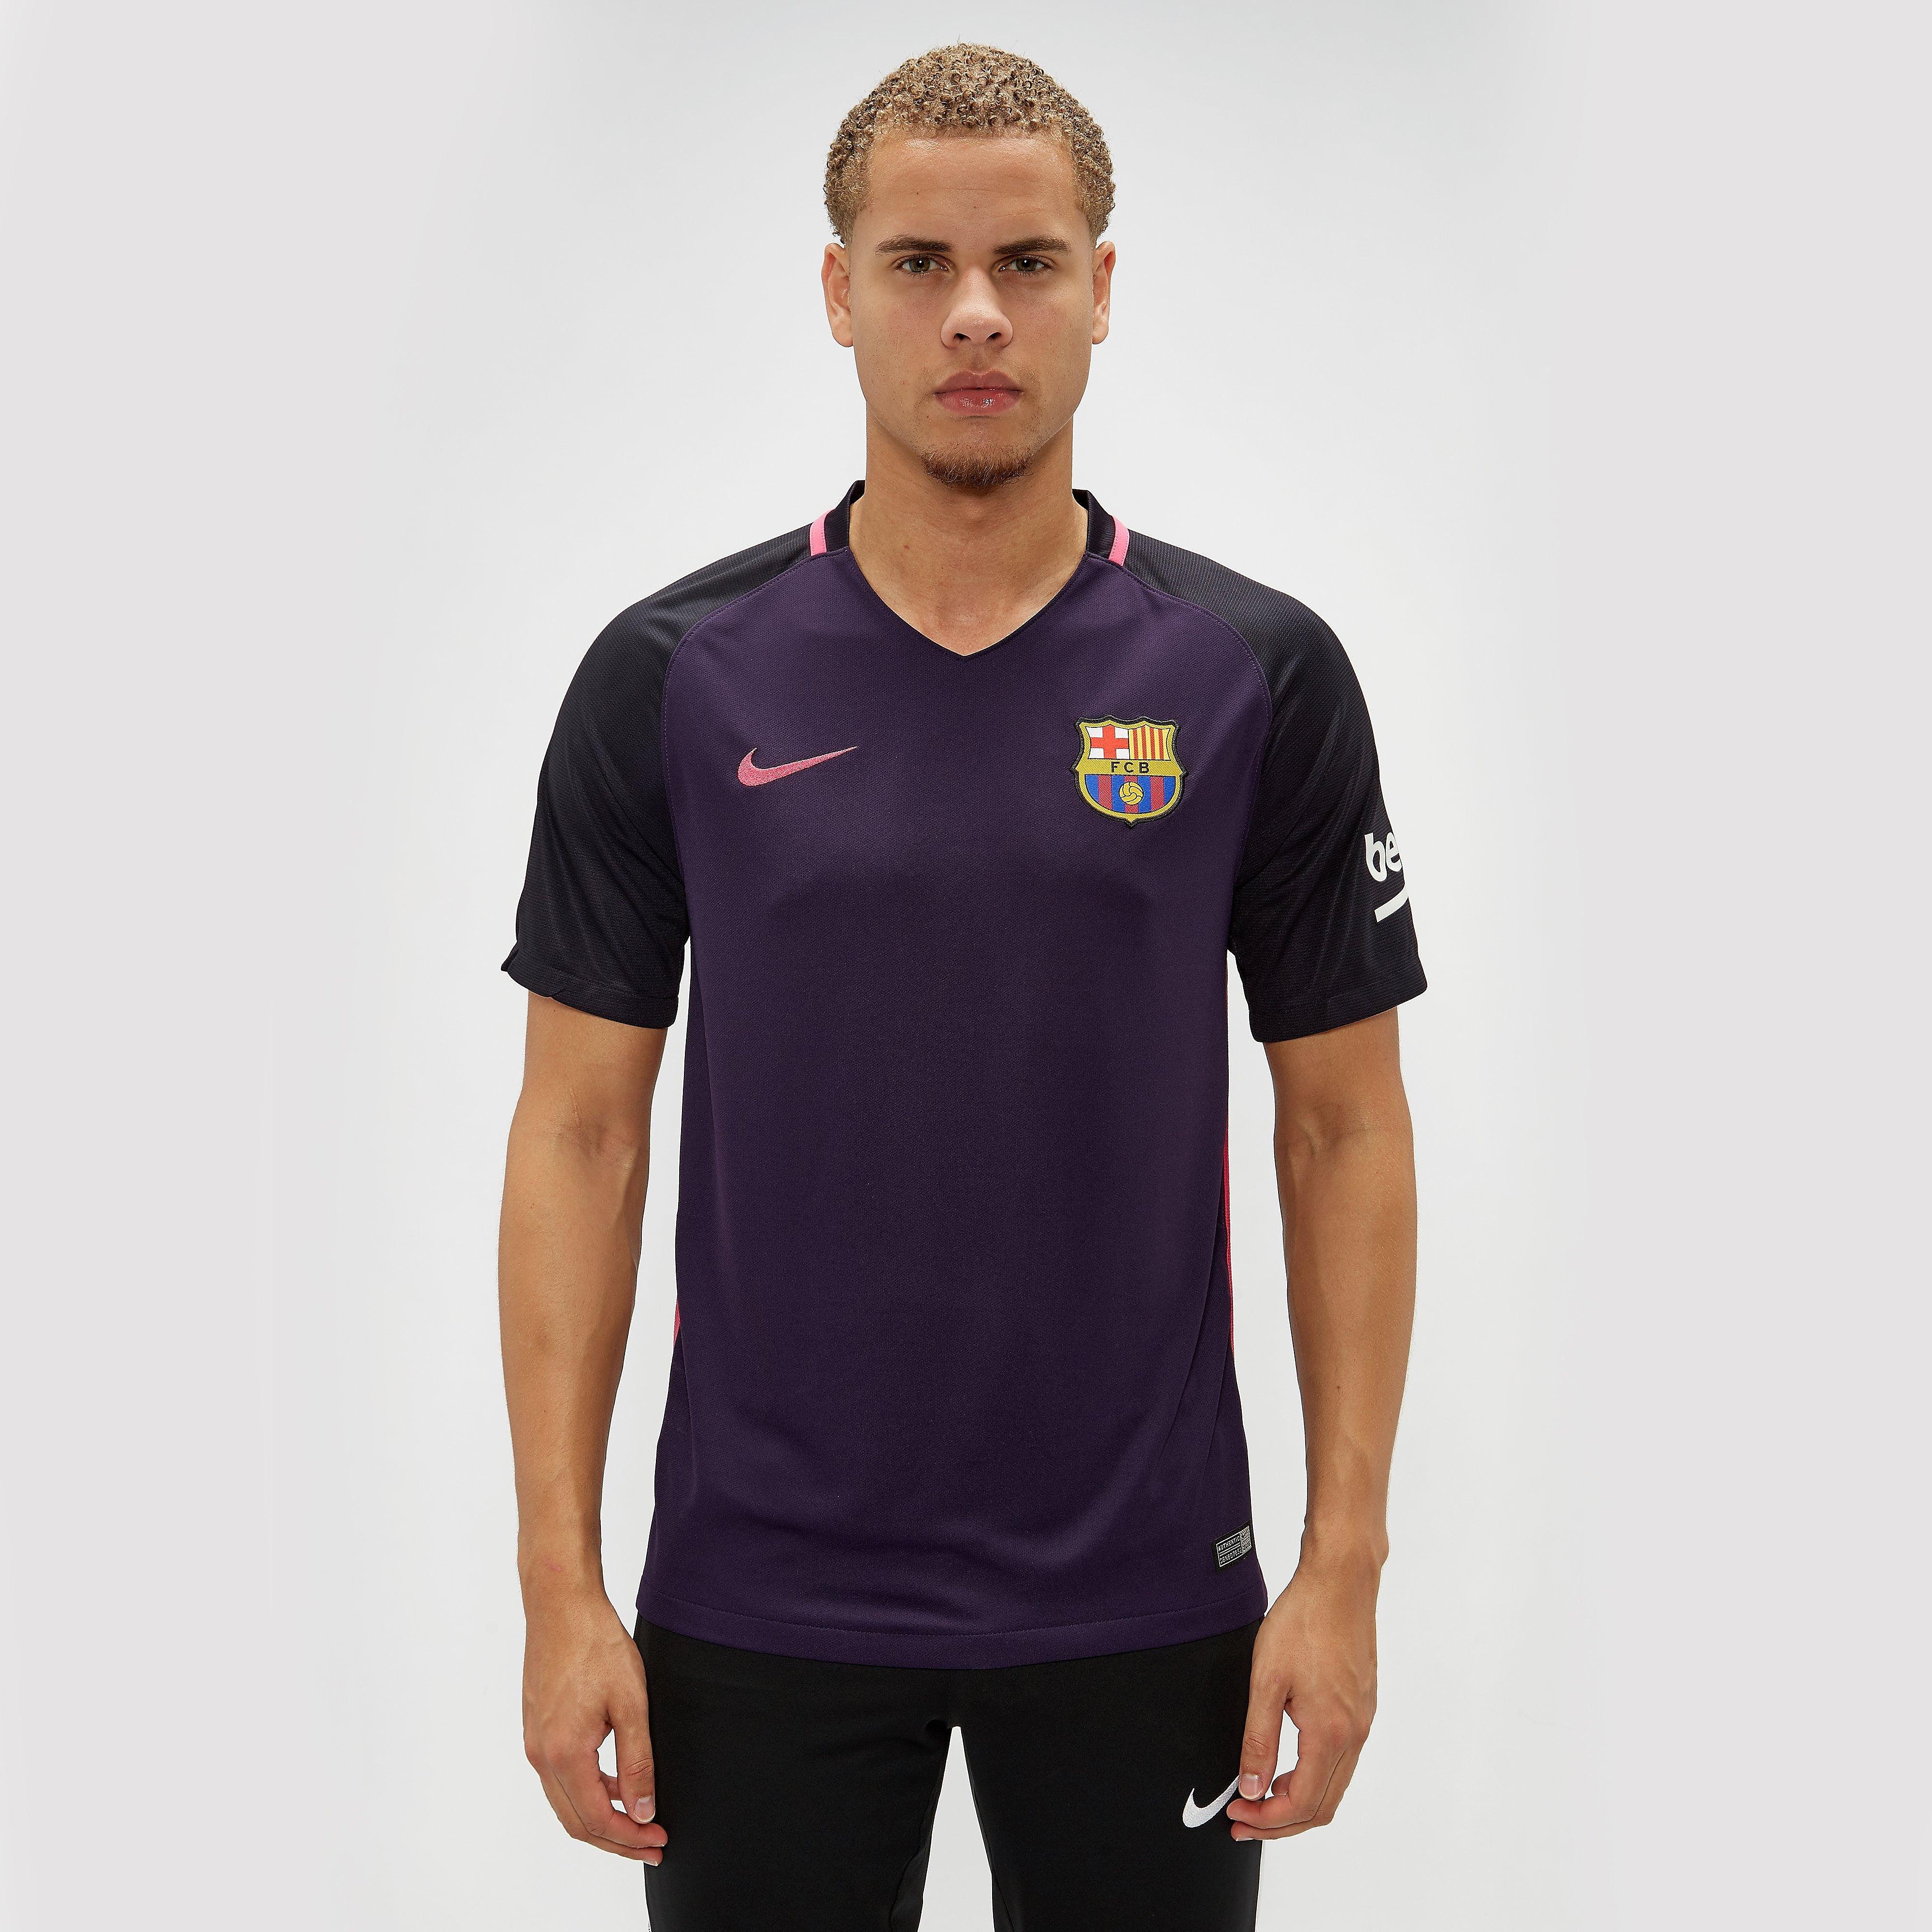 Nike EVAPP M REPLICA